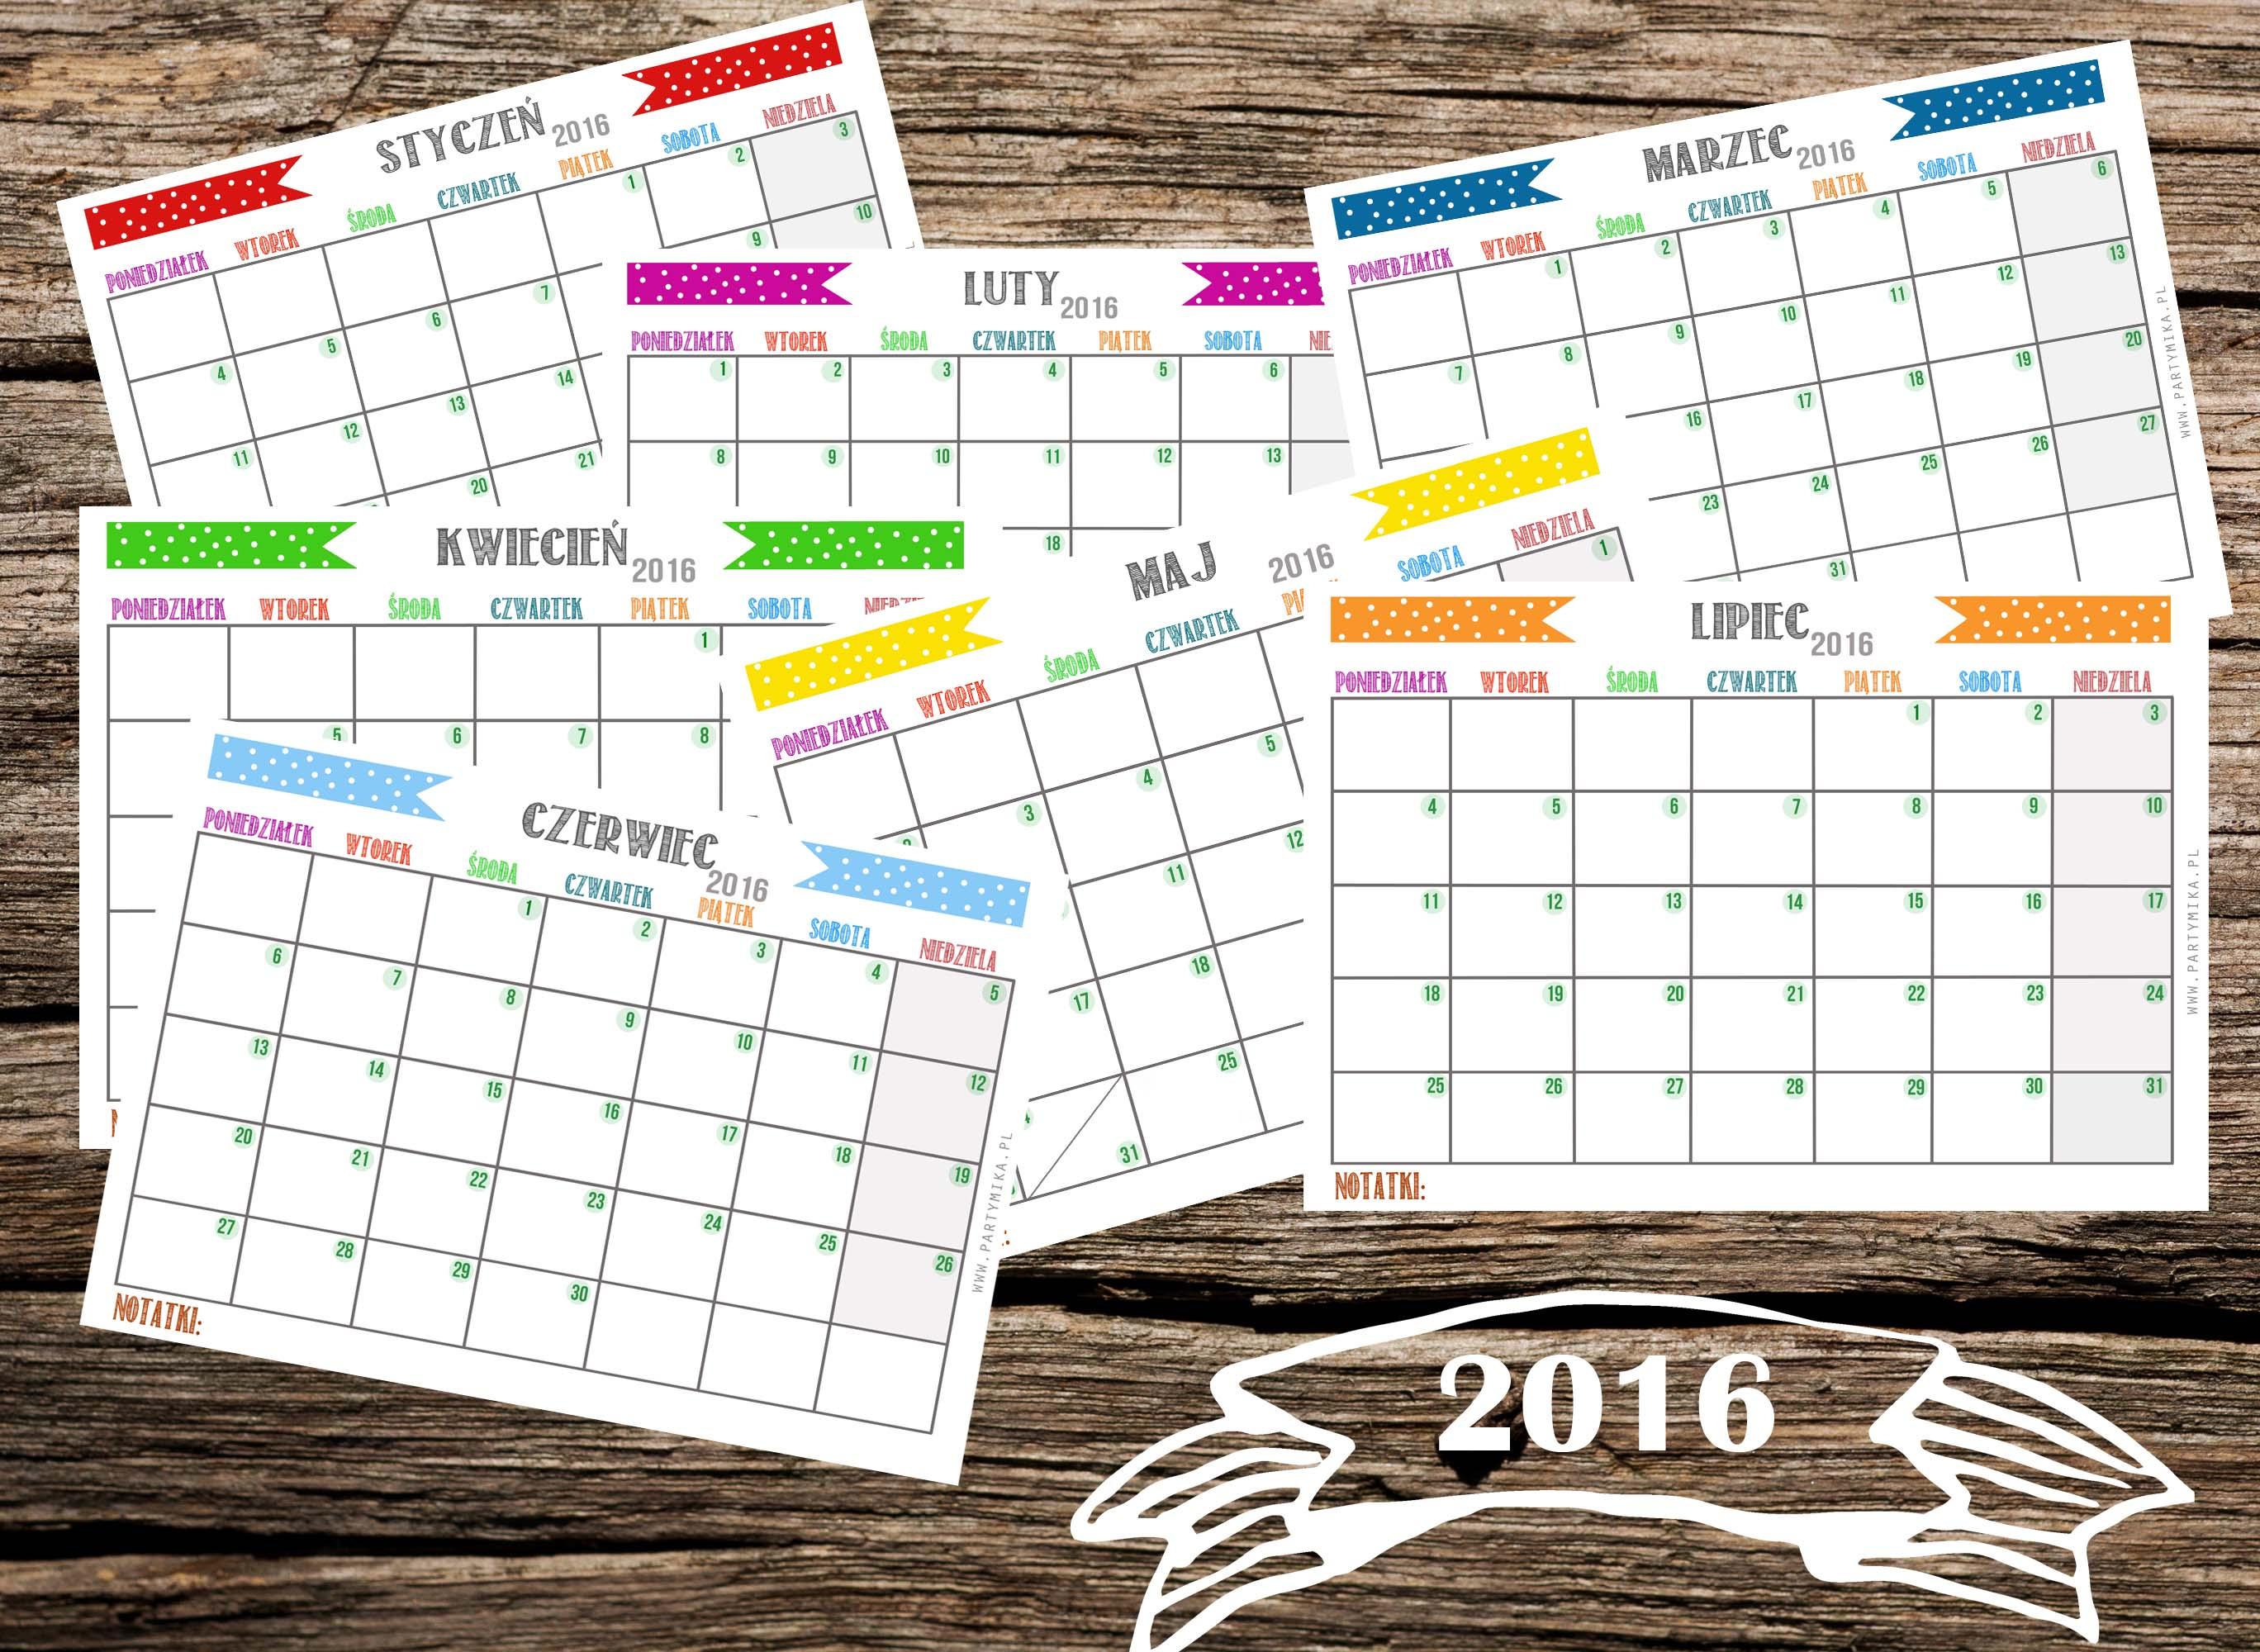 Kalendarz do druku 2016 rok! - partymika